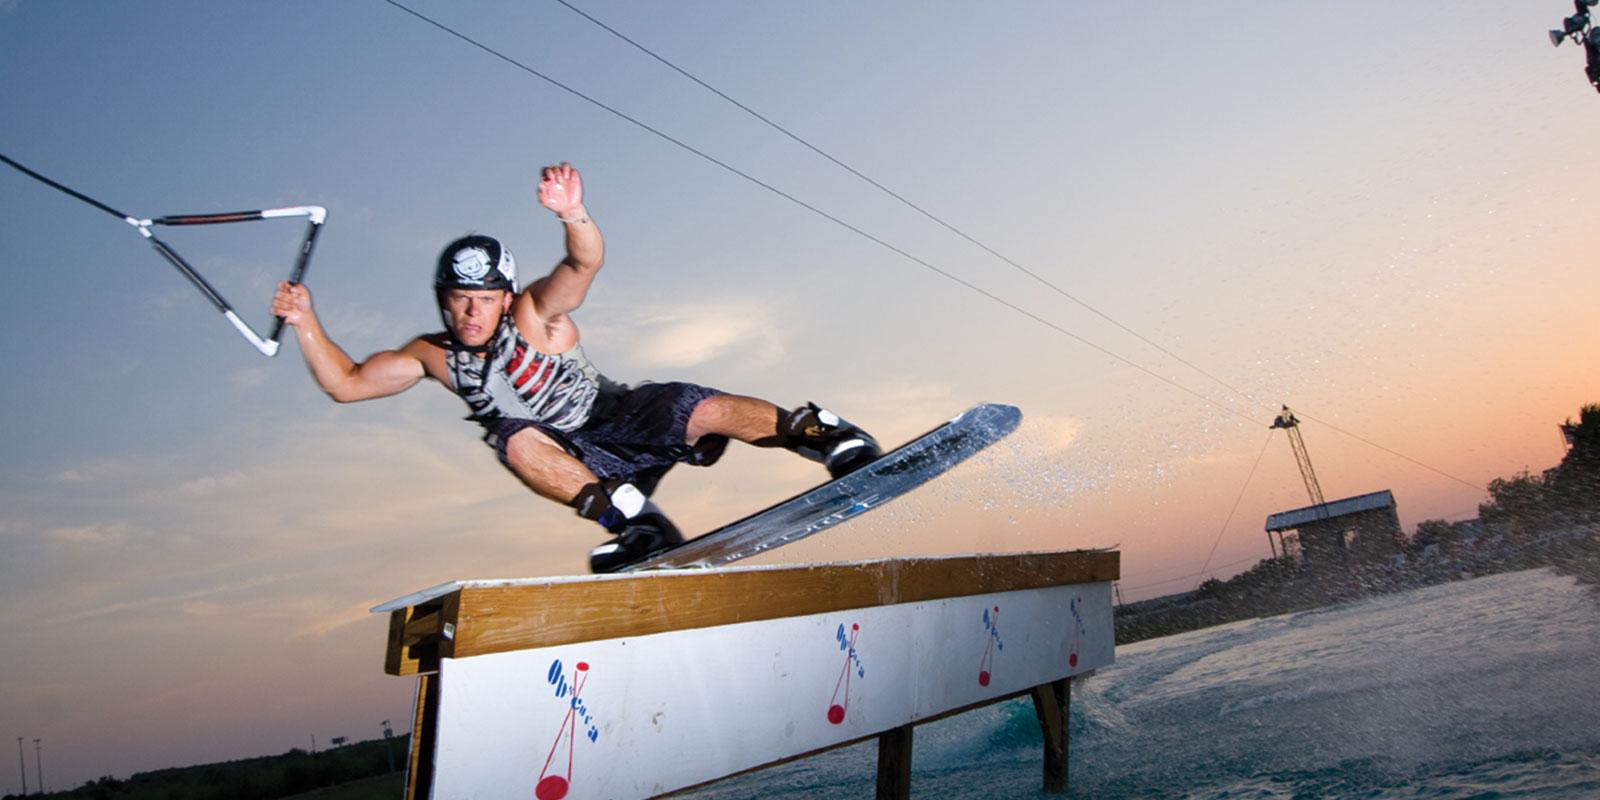 Twister Ski Shop Online Wakeboards And Waterski Shop